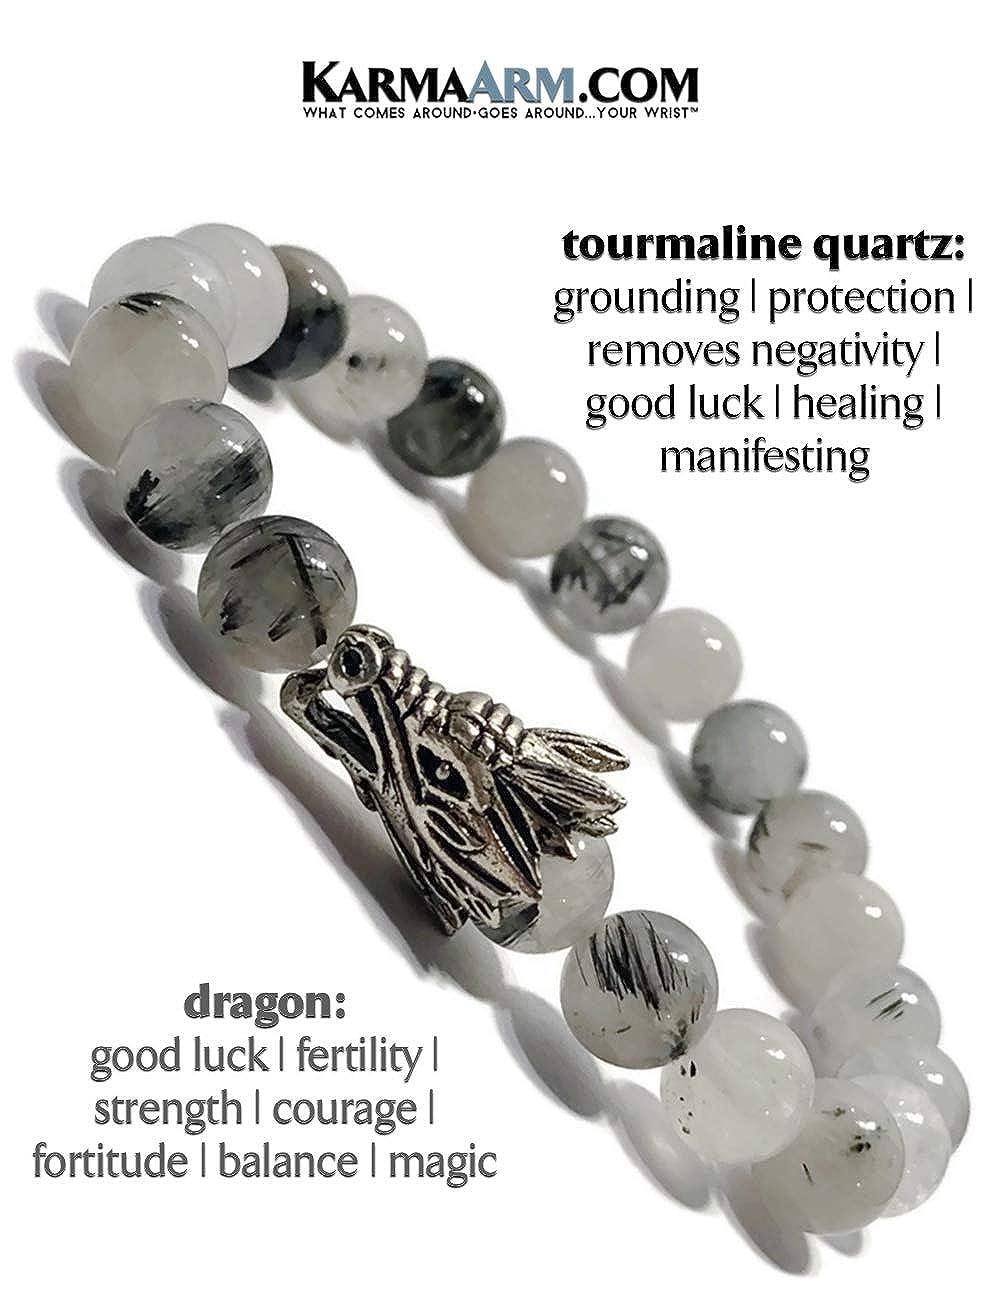 Beaded Meditation Spiritual Stretch Mantra Reiki Healing Energy Boho Charm Chakra Wrap Yoga Jewelry /& Gemstone Gifts Challenges Natural Tourrmaline Quartz Bracelet Dragon Bracelet